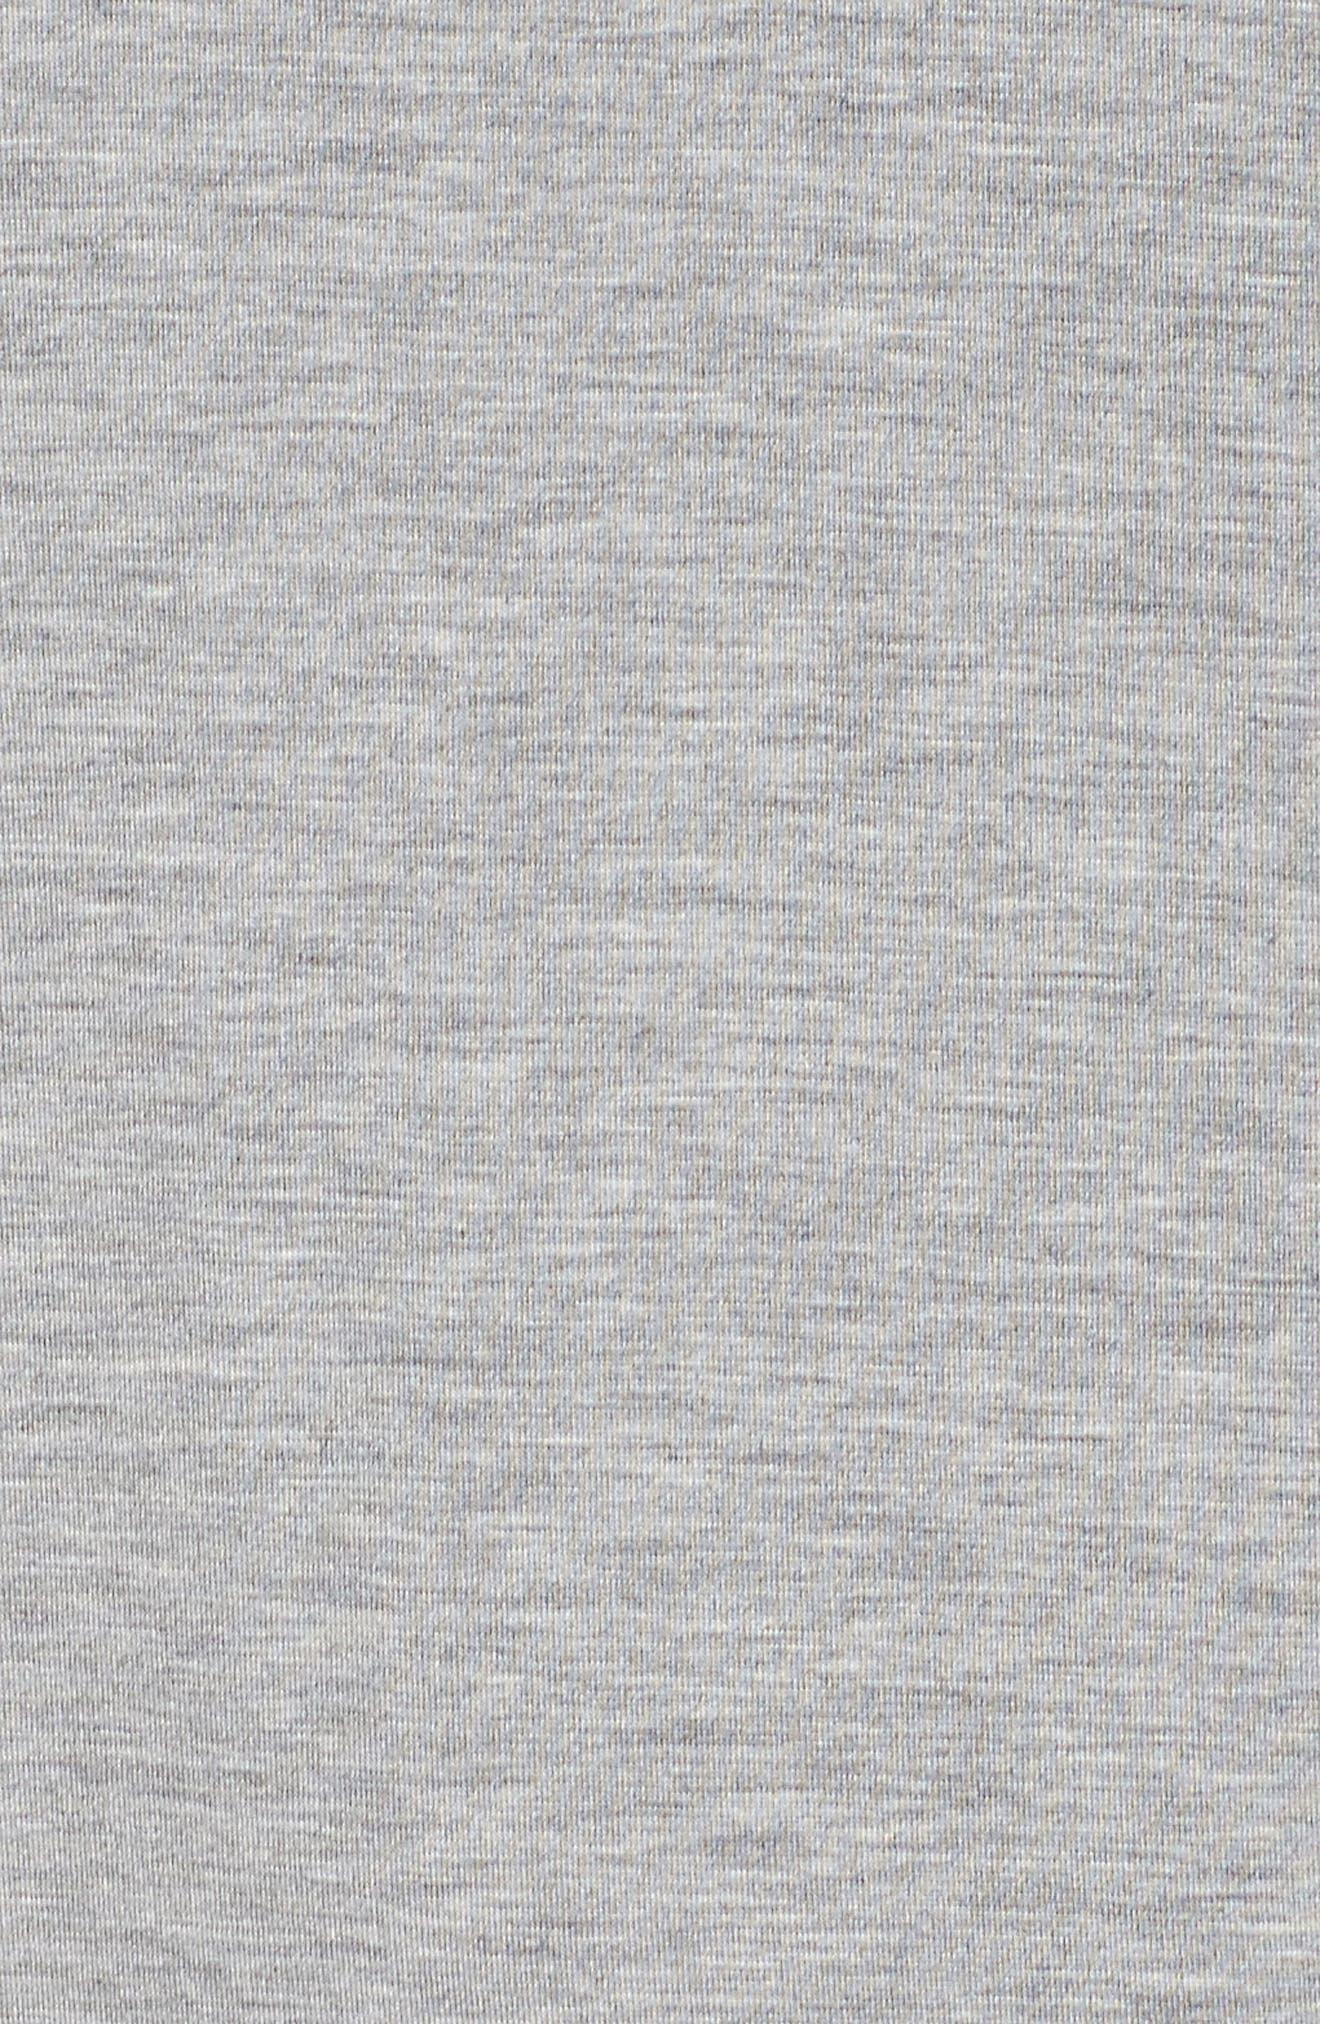 Sleep Shirt,                             Alternate thumbnail 14, color,